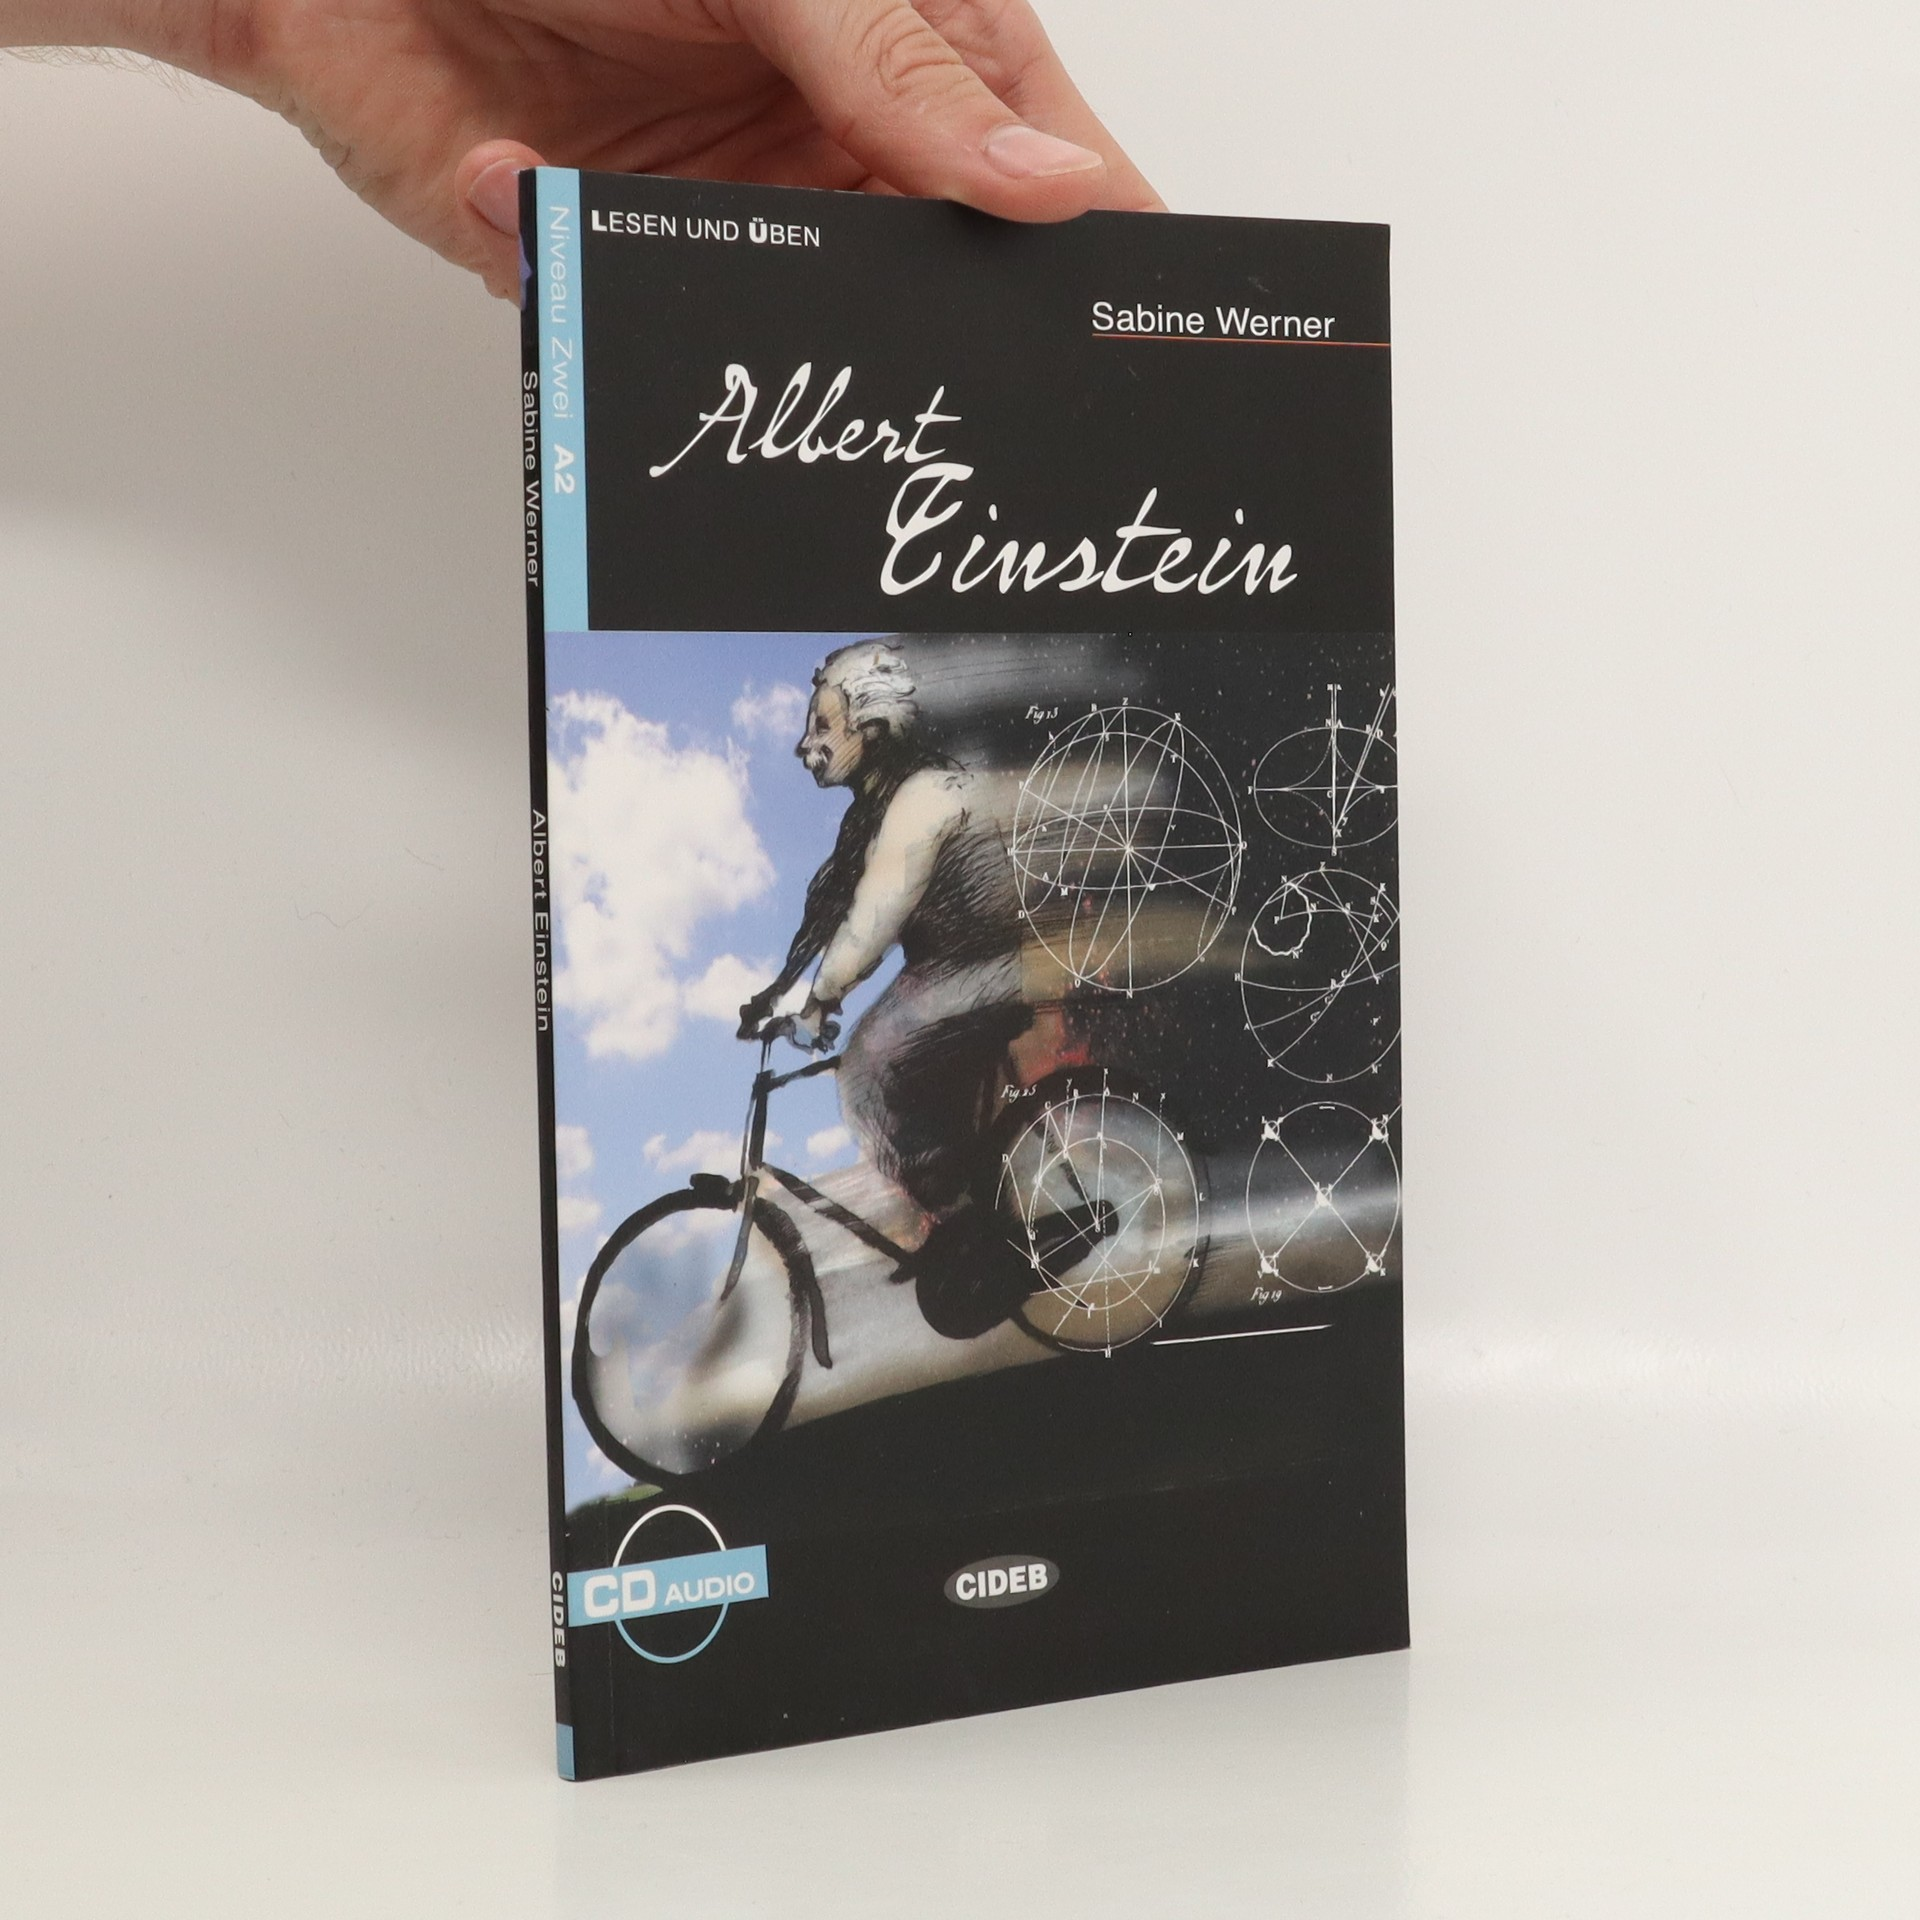 antikvární kniha Albert Einstein, 2006